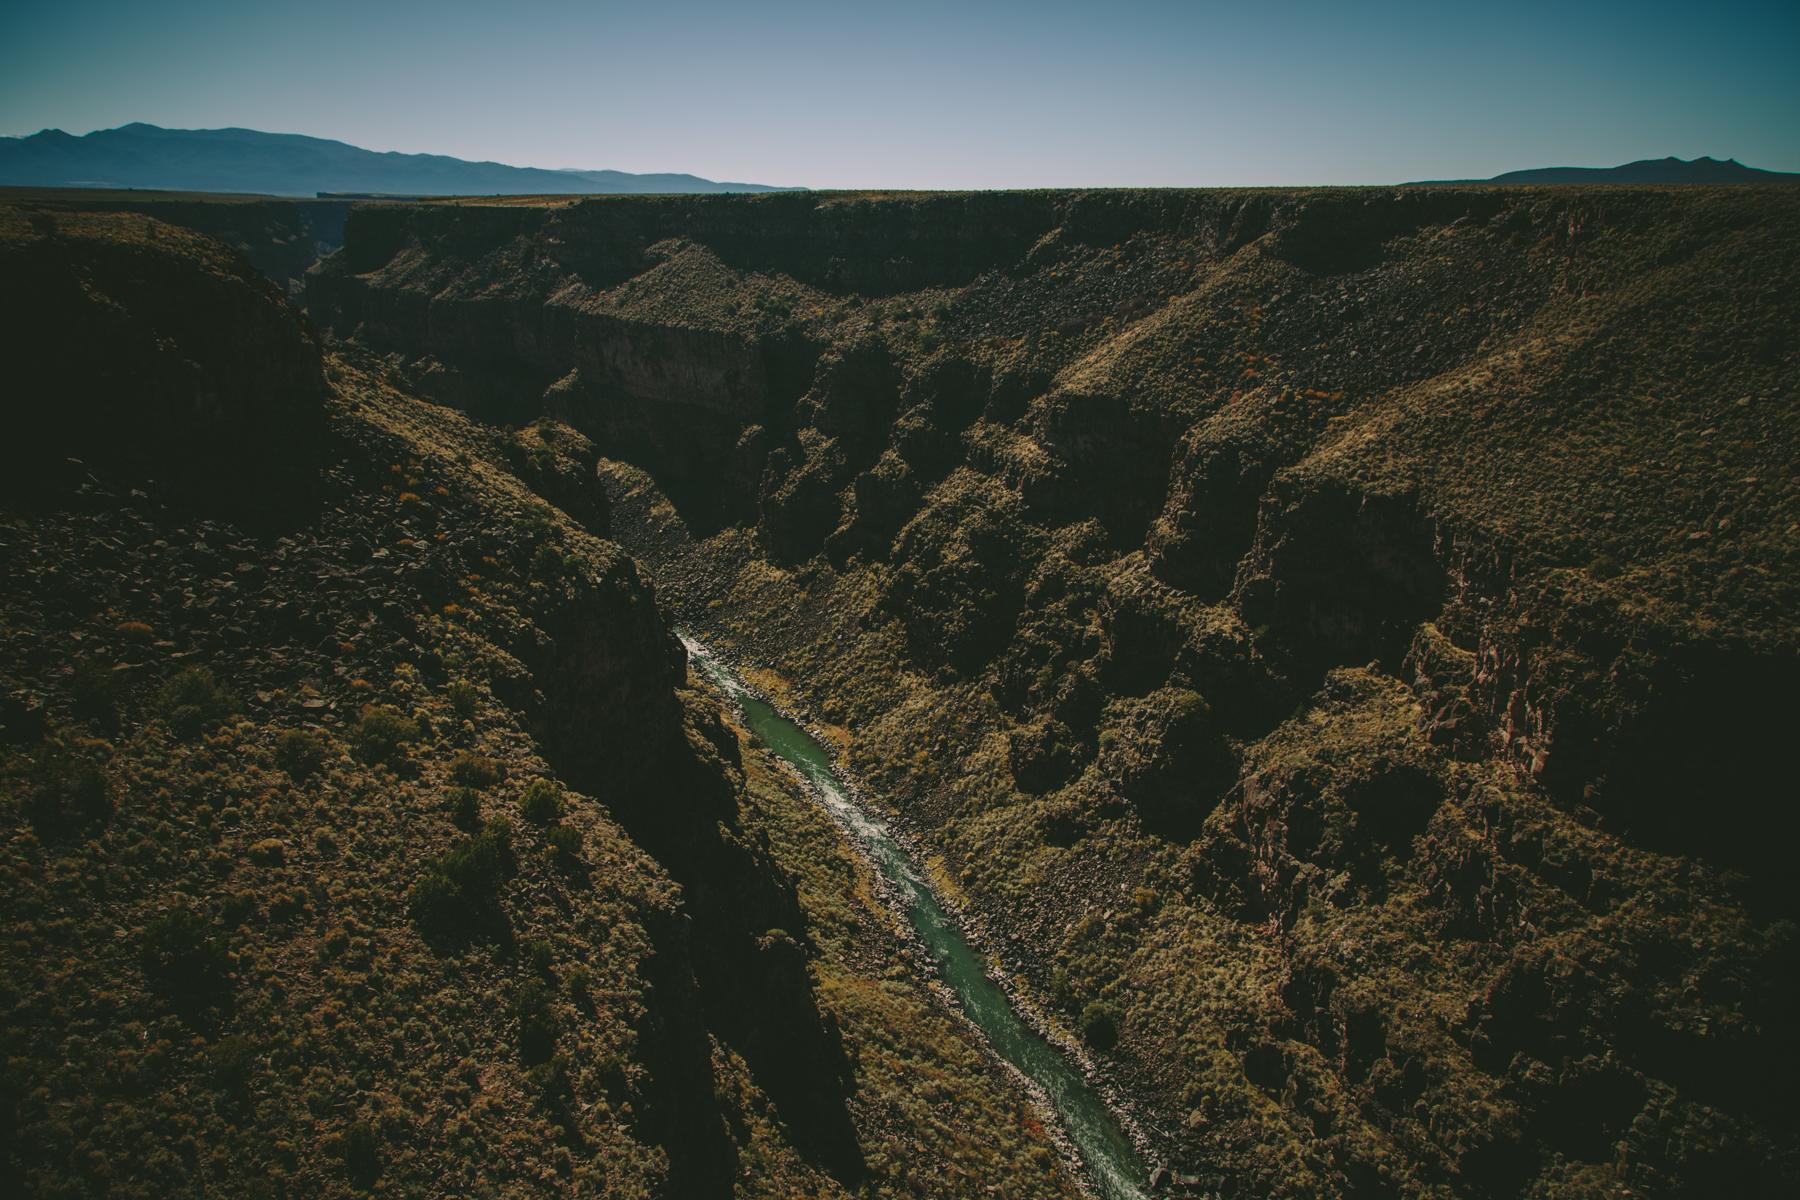 Santa Fe, NM // Honeymoon